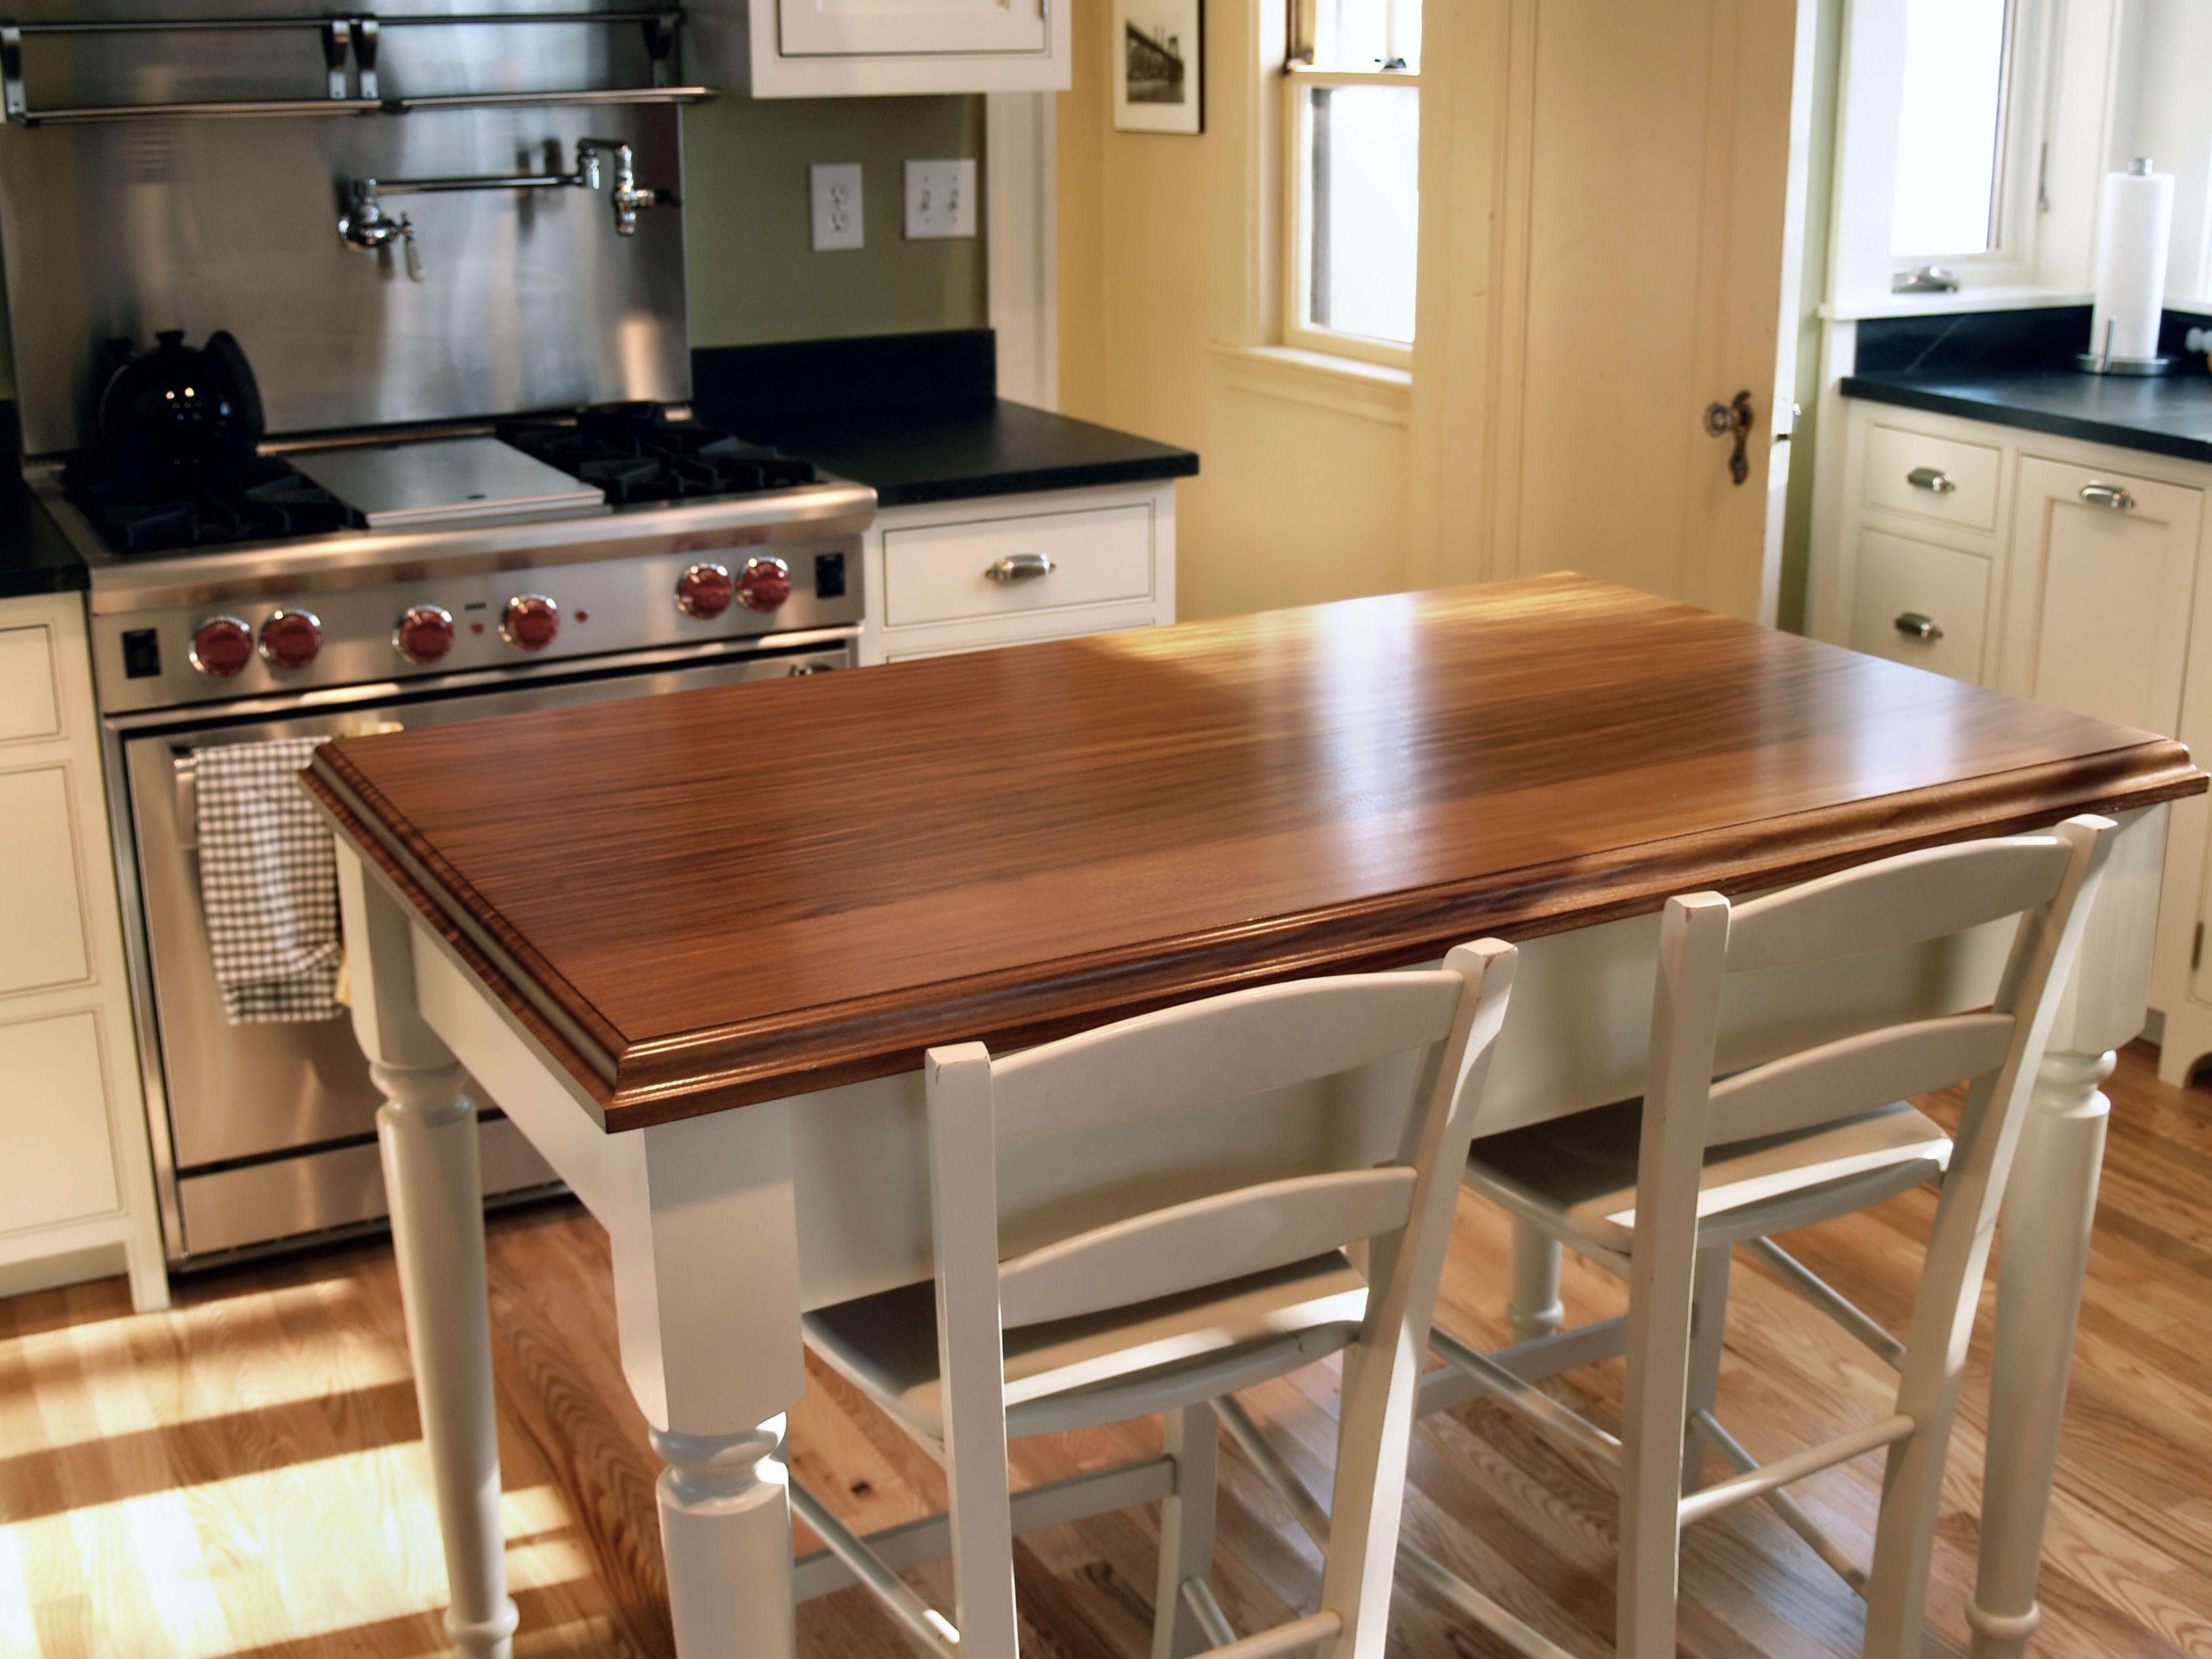 Afromosia Wood Countertop Photo Gallery By Devos Custom